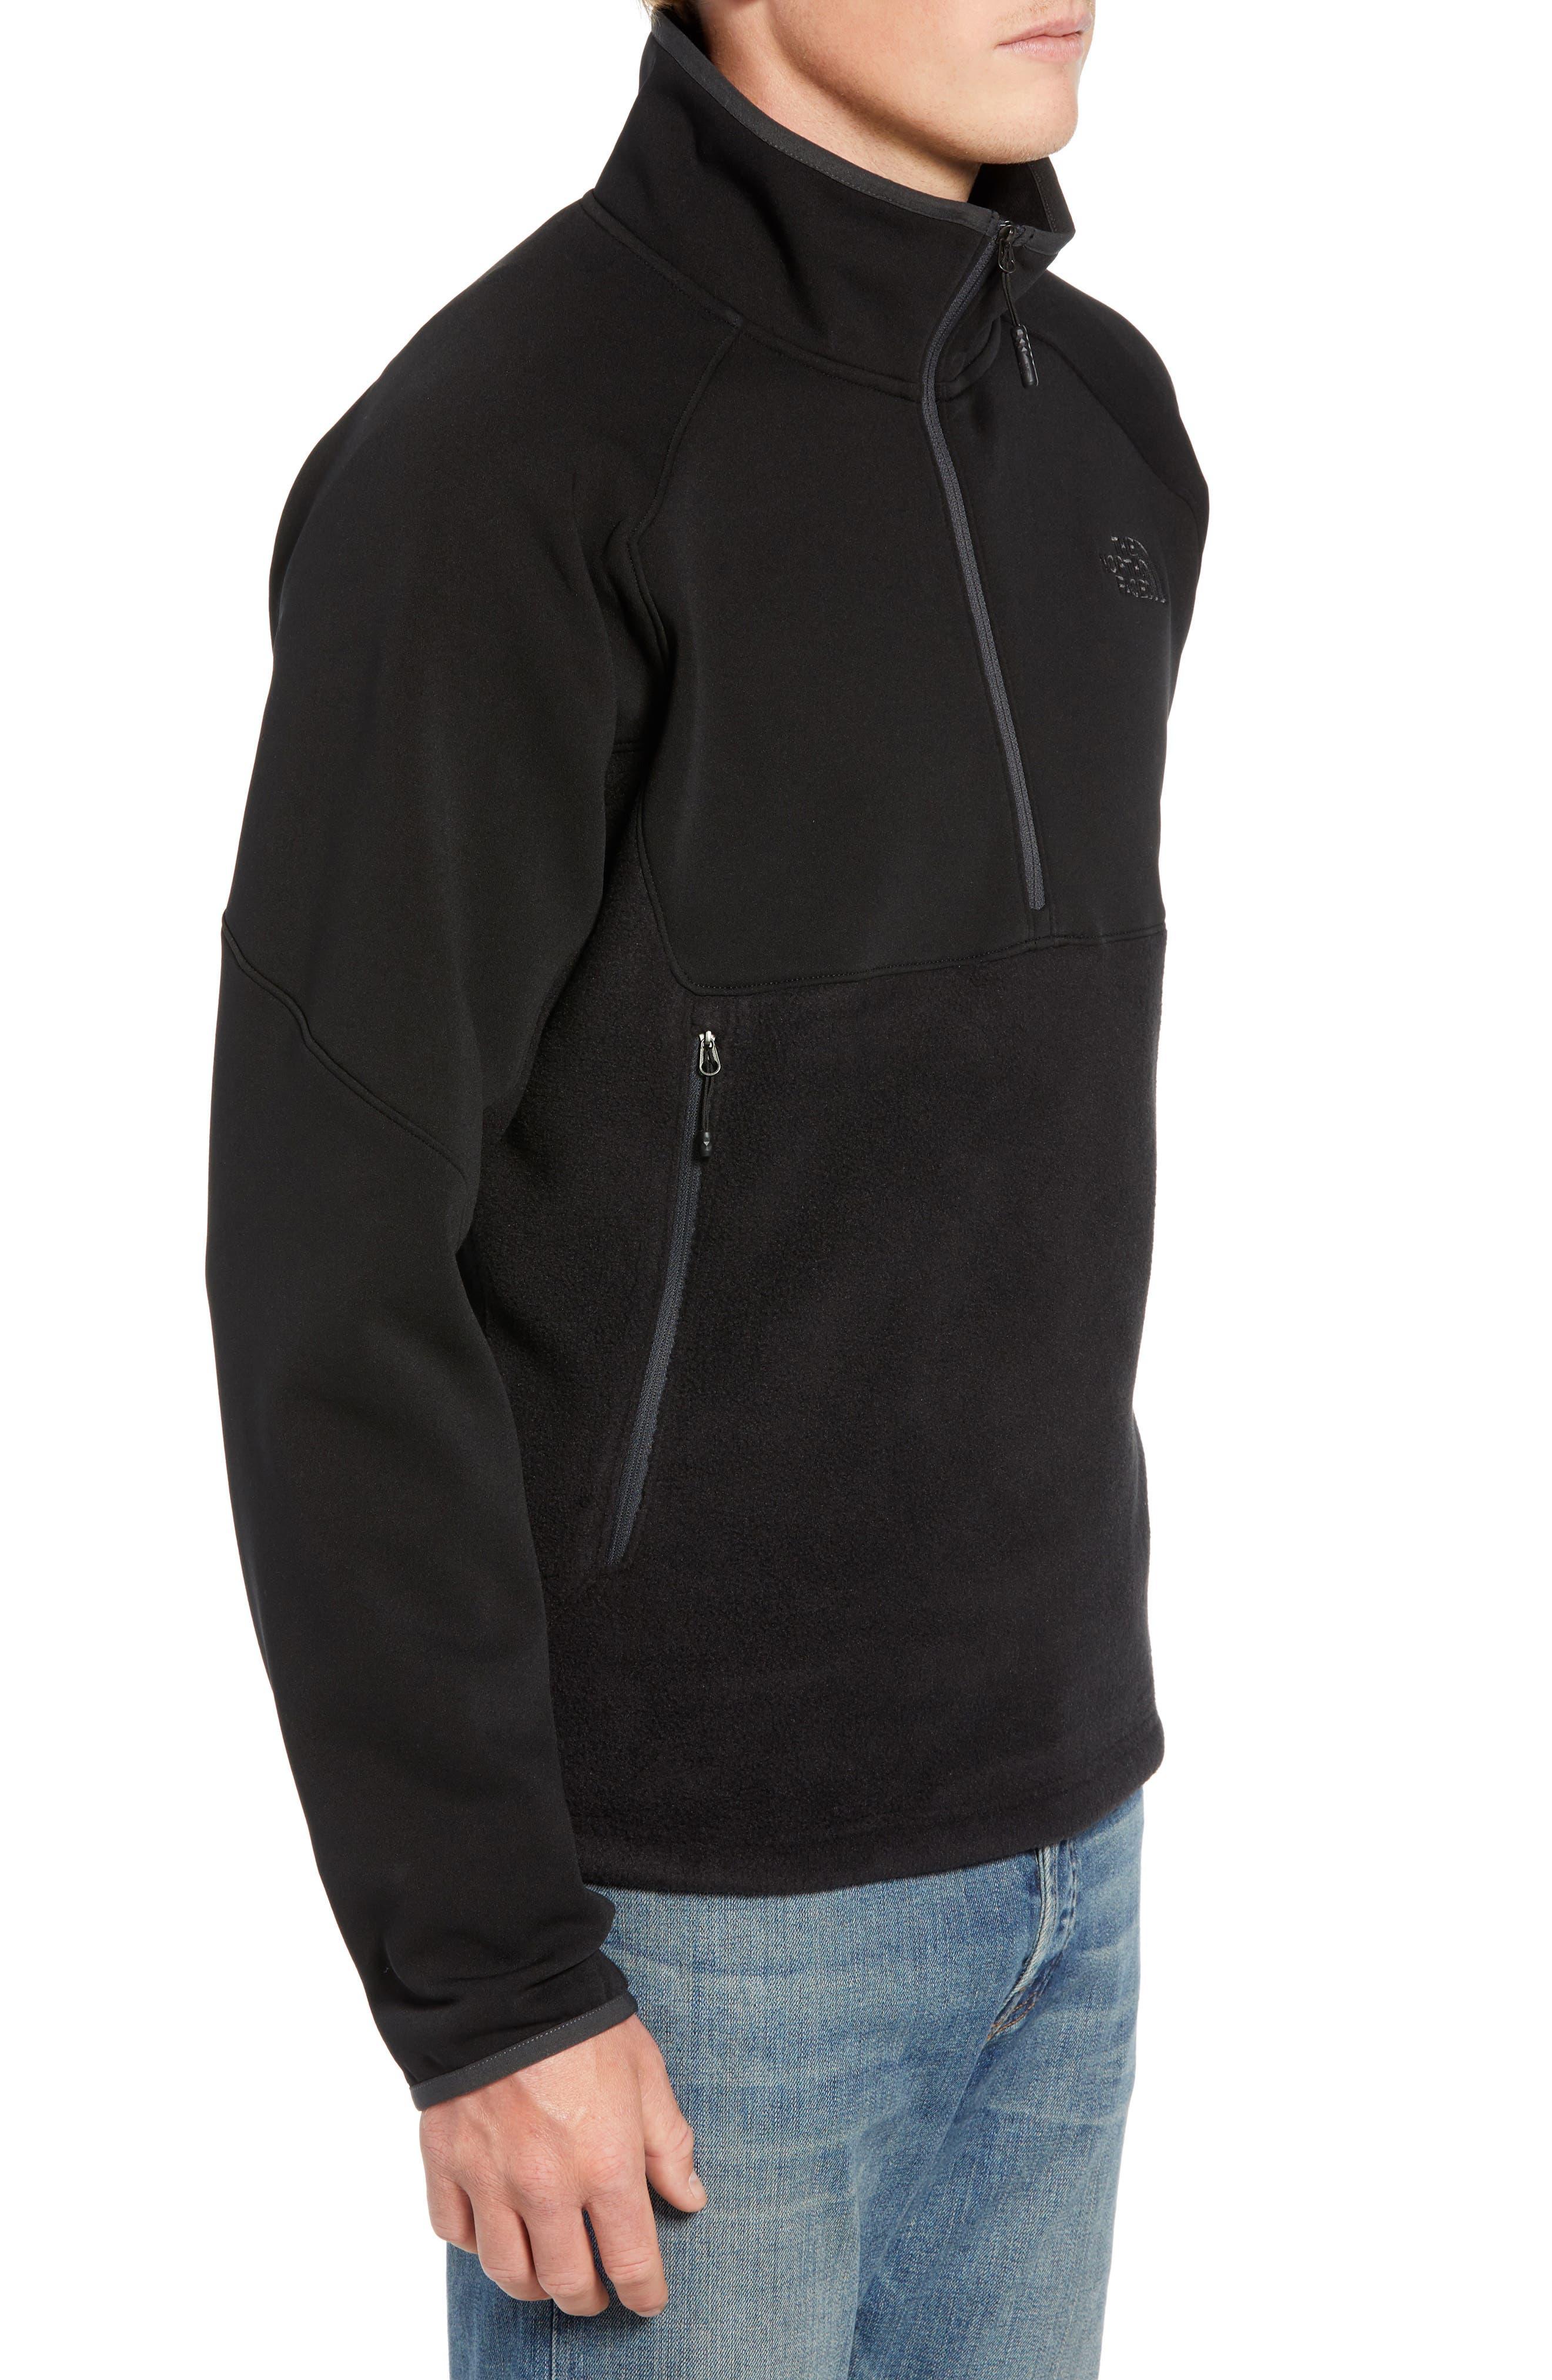 THE NORTH FACE, Tolmiepeak Hybrid Half-Zip Pullover, Alternate thumbnail 4, color, 001